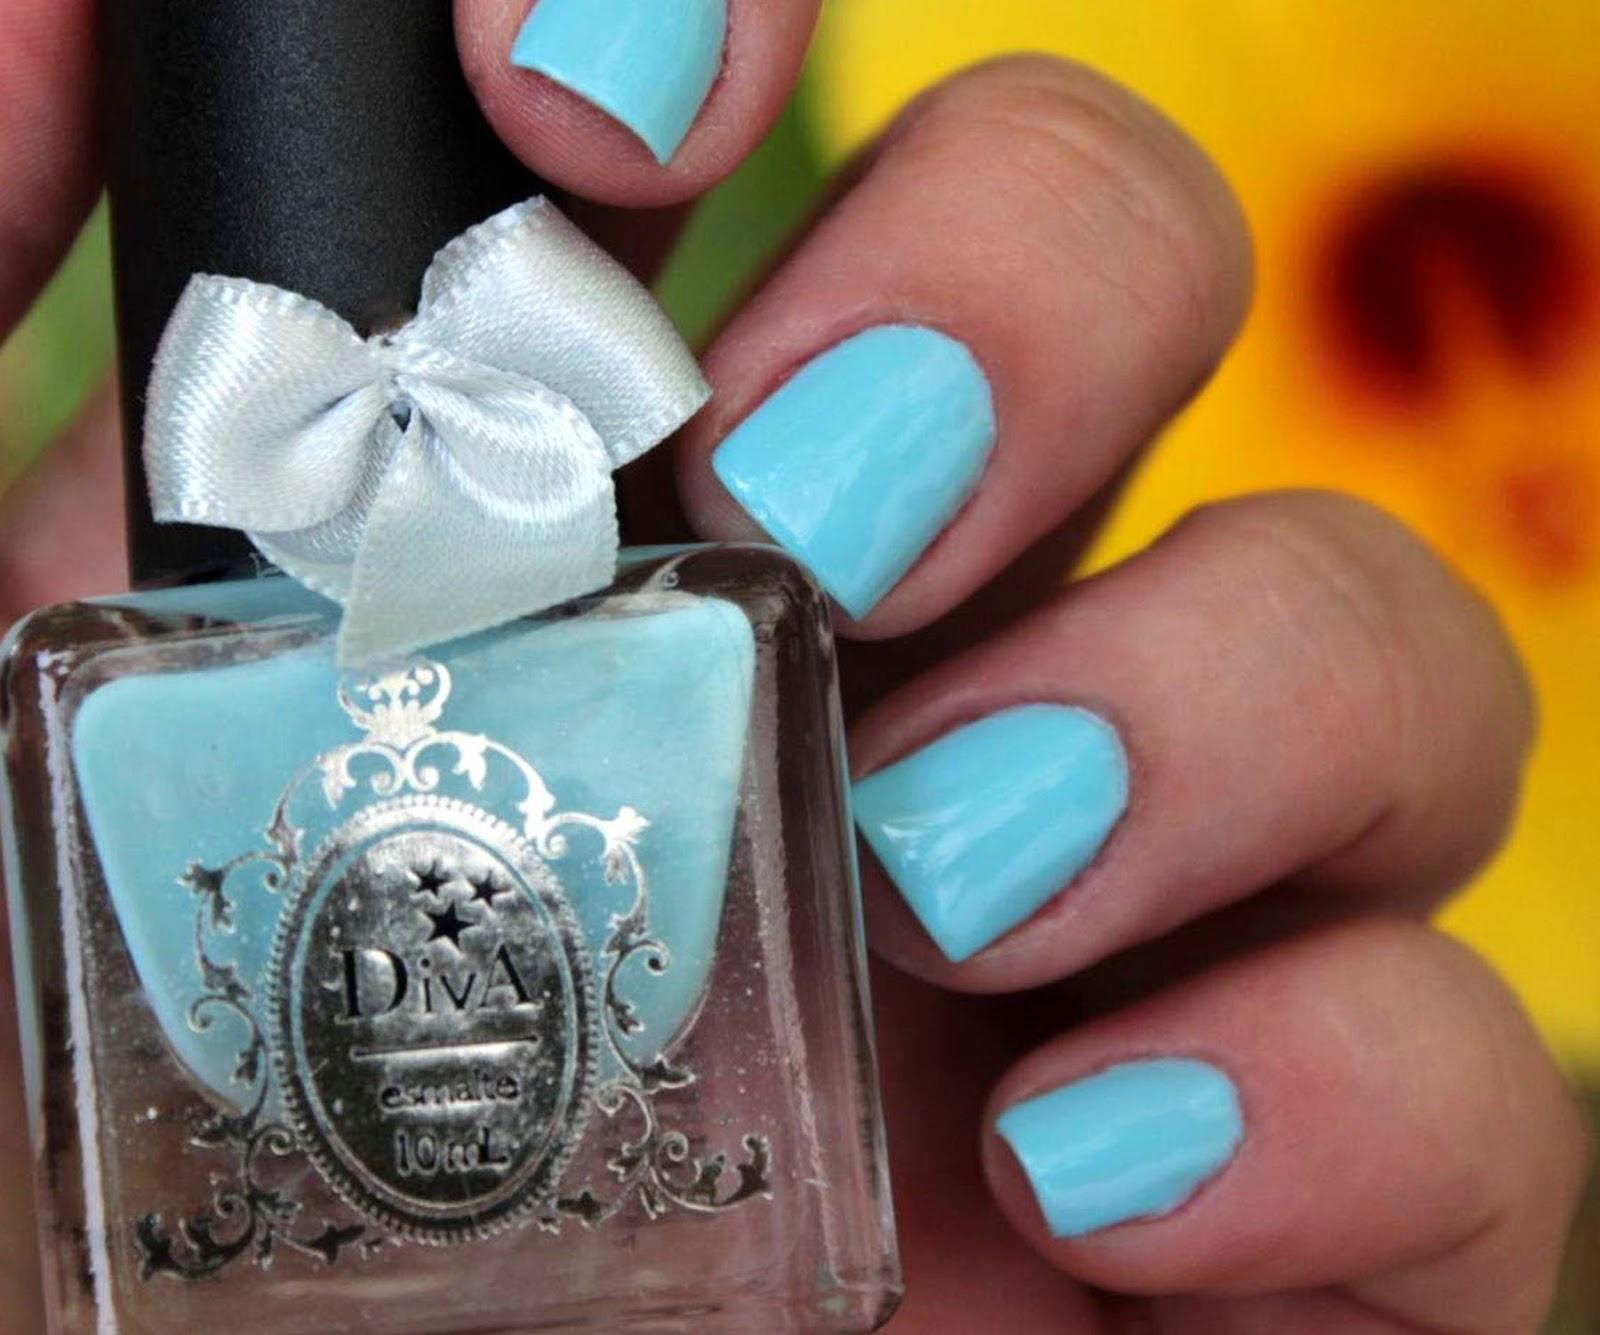 diva cosmetics, diva, mão feita, carol, esmaltes, nailpolish, azul, cremoso